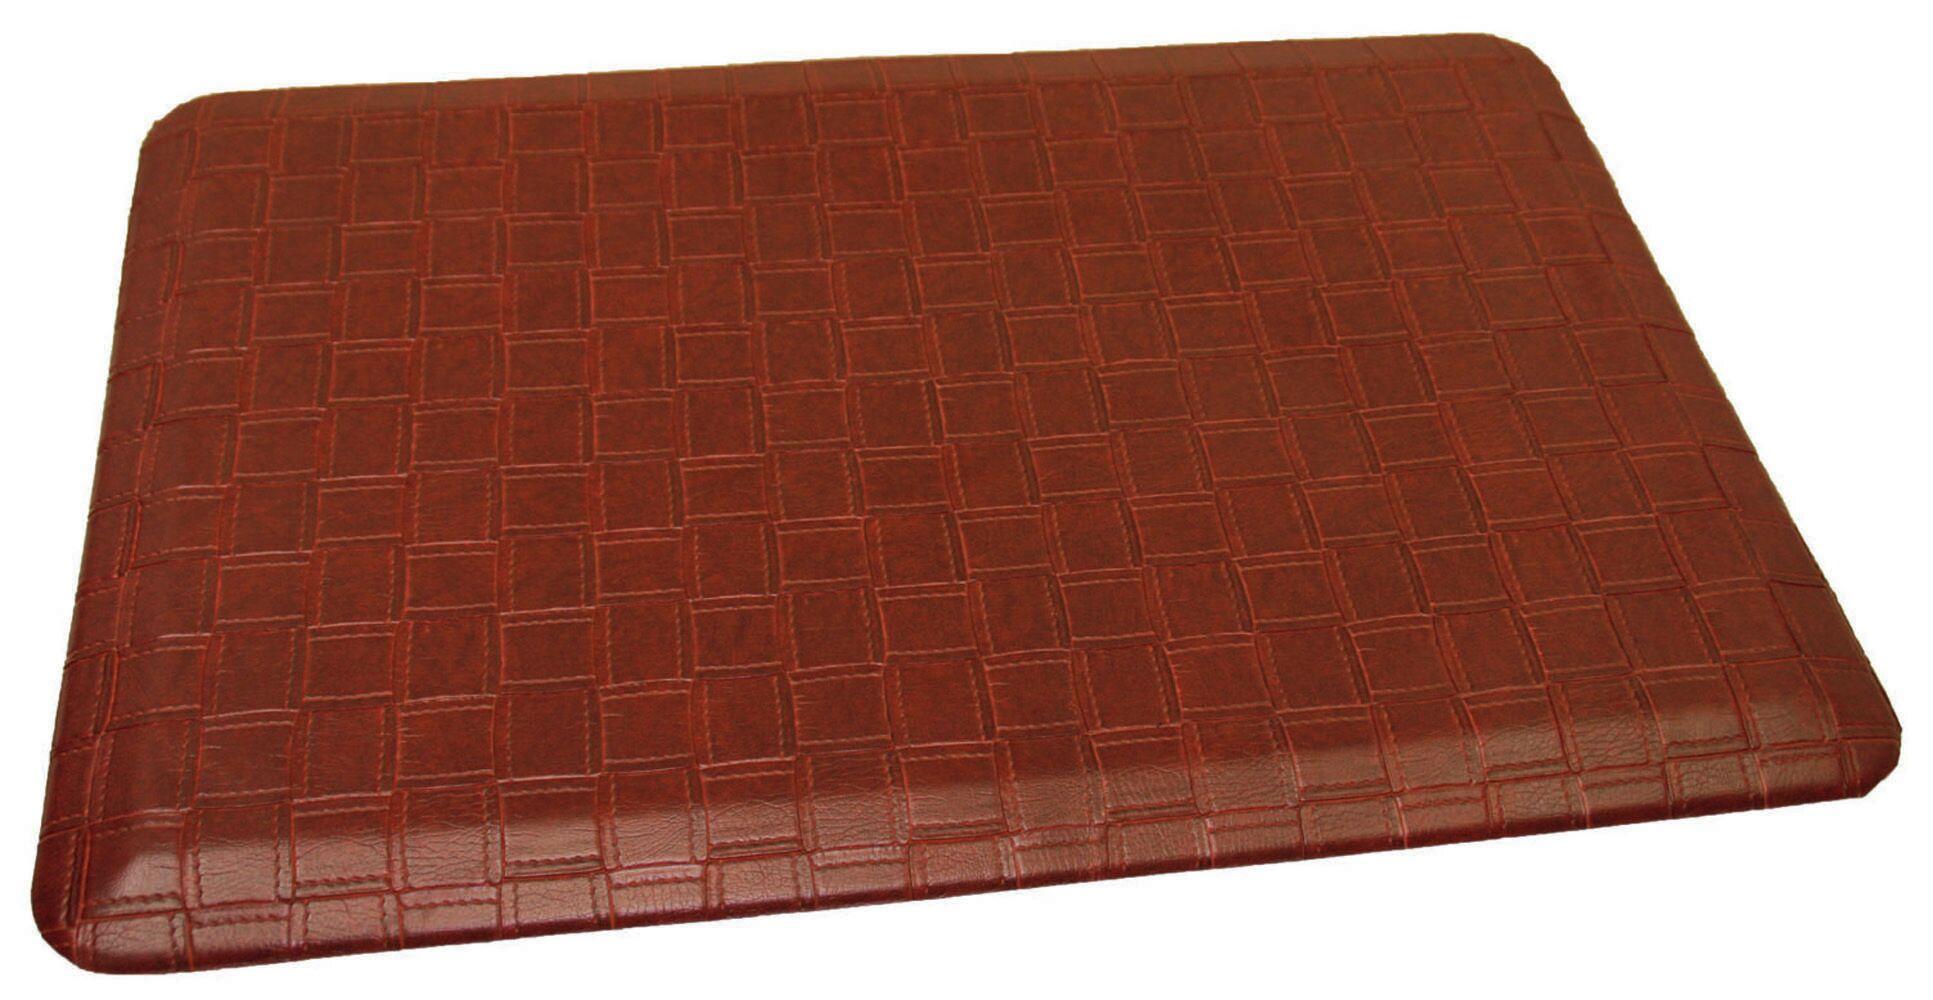 Anti-Fatigue Comfort Kitchen Mat Mat Size: 2' x 4', Color: Rich Reddish